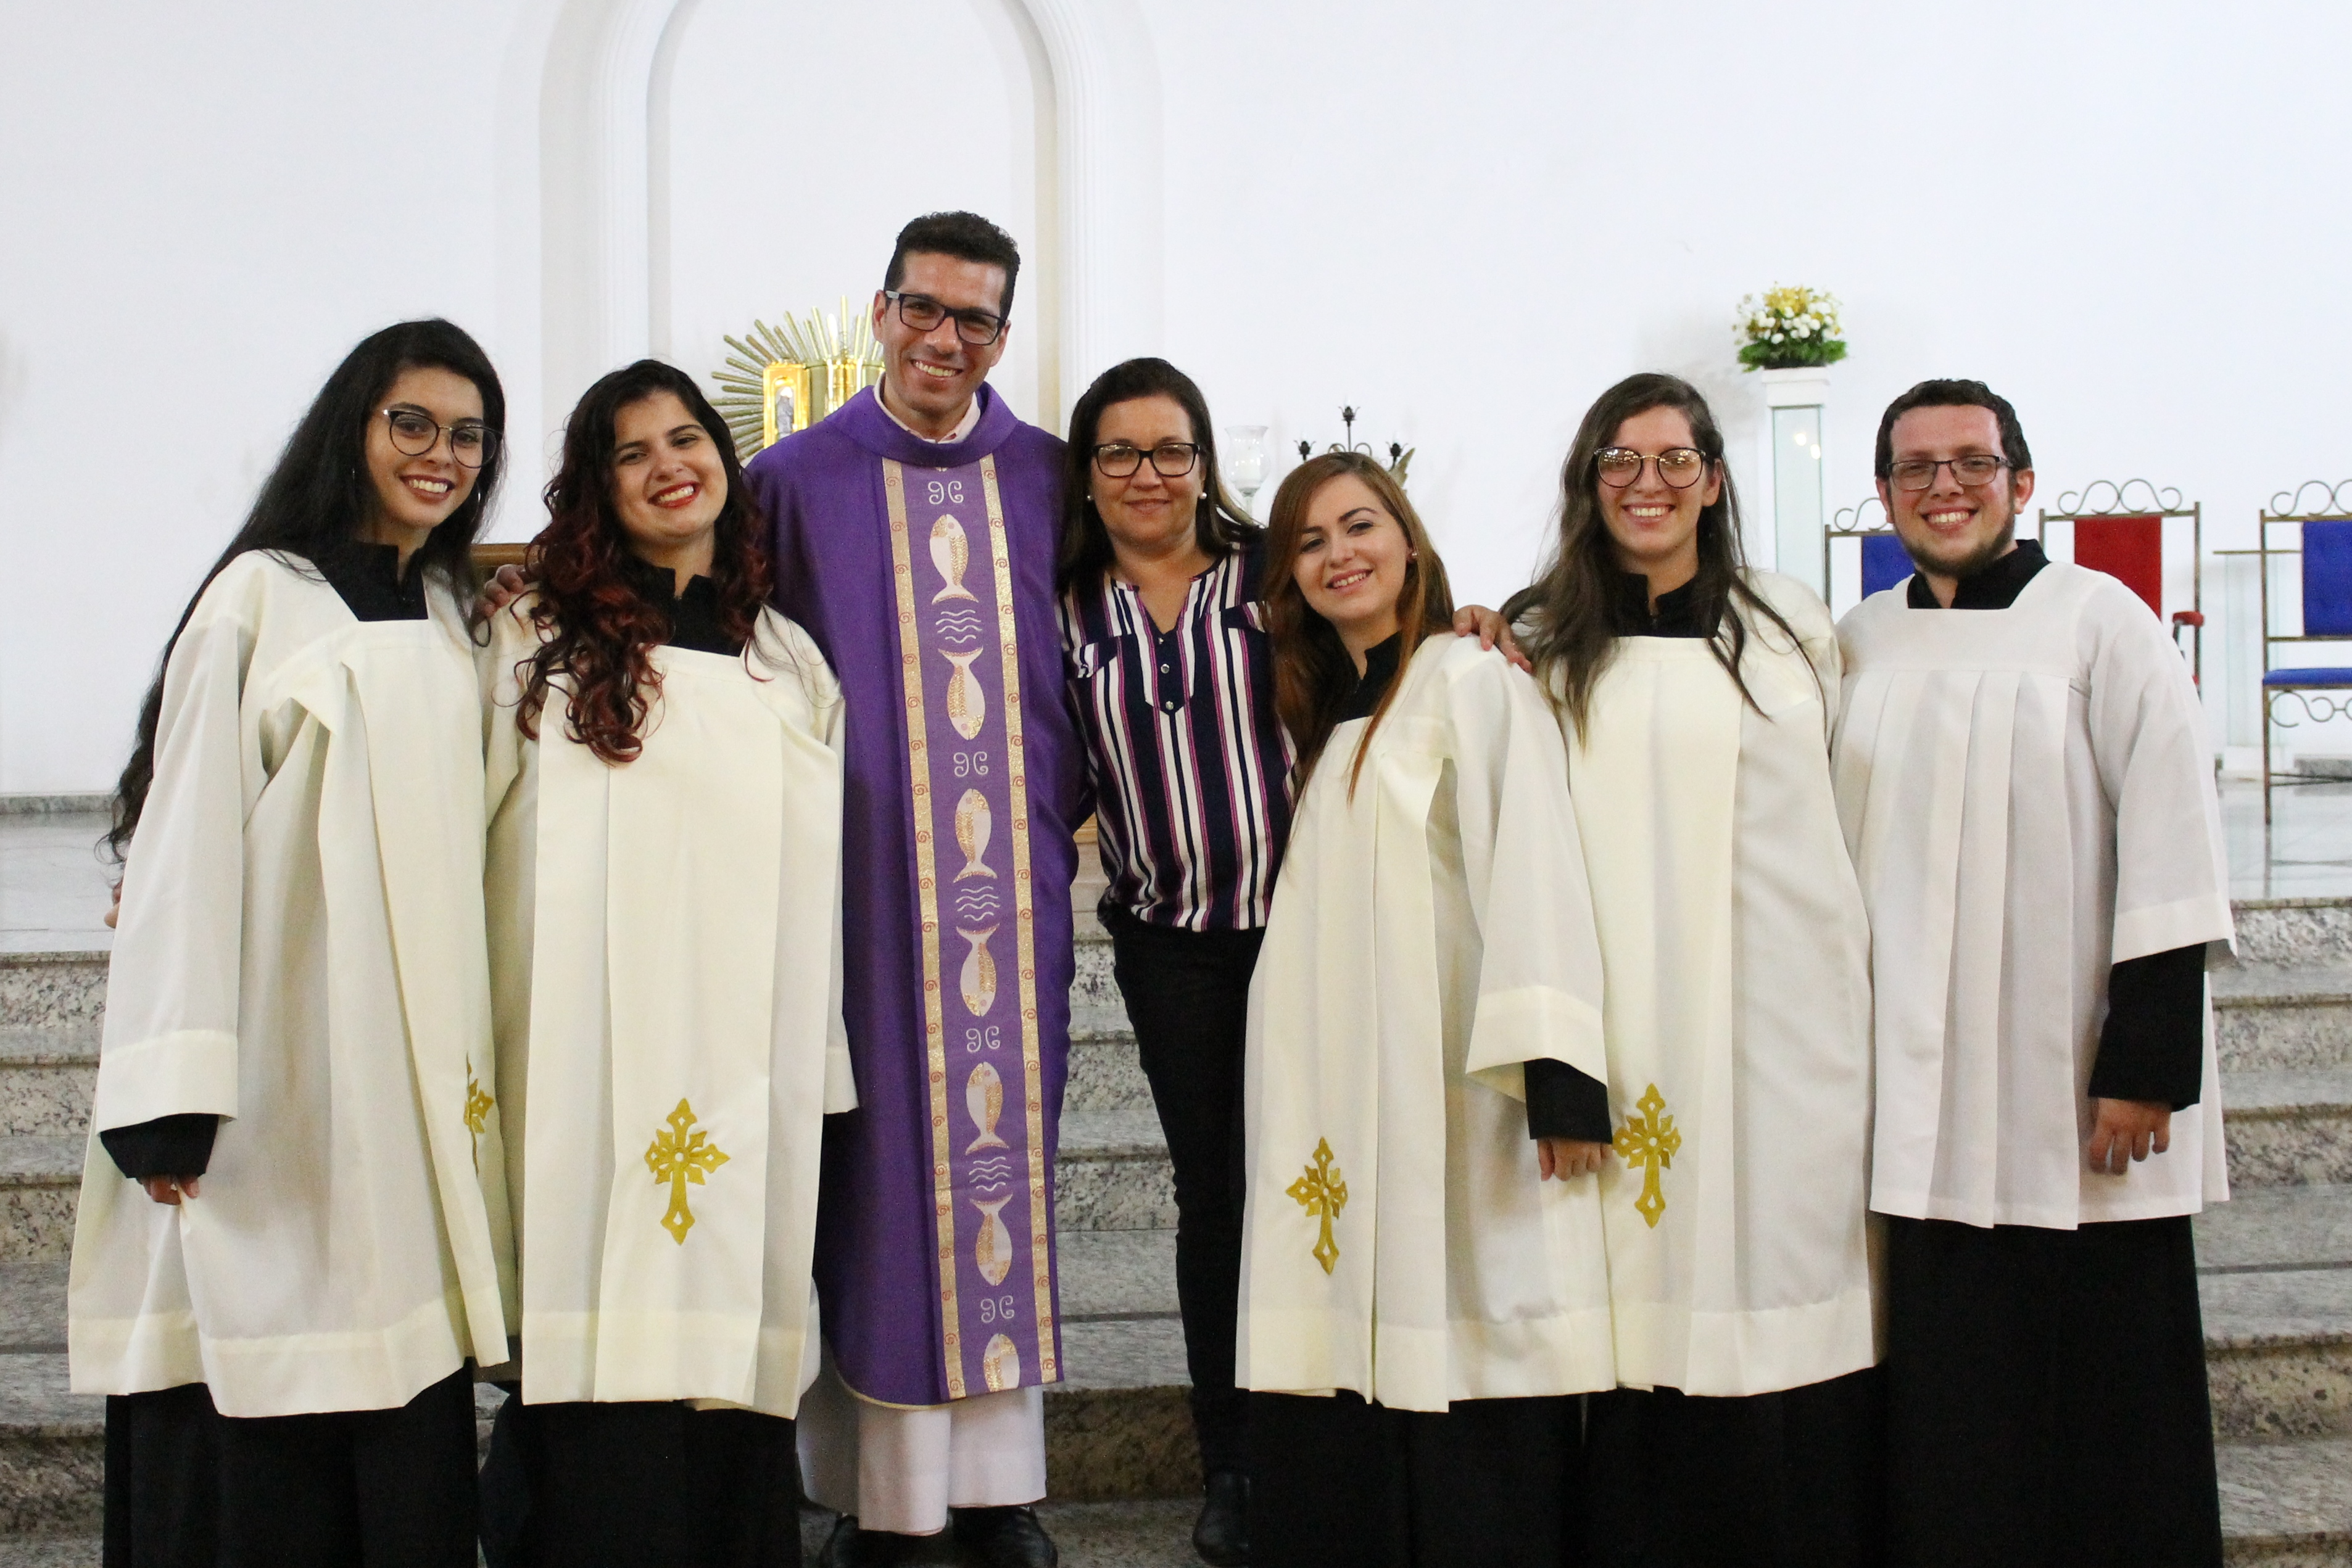 Cerimoniários Paróquia Santa Teresin